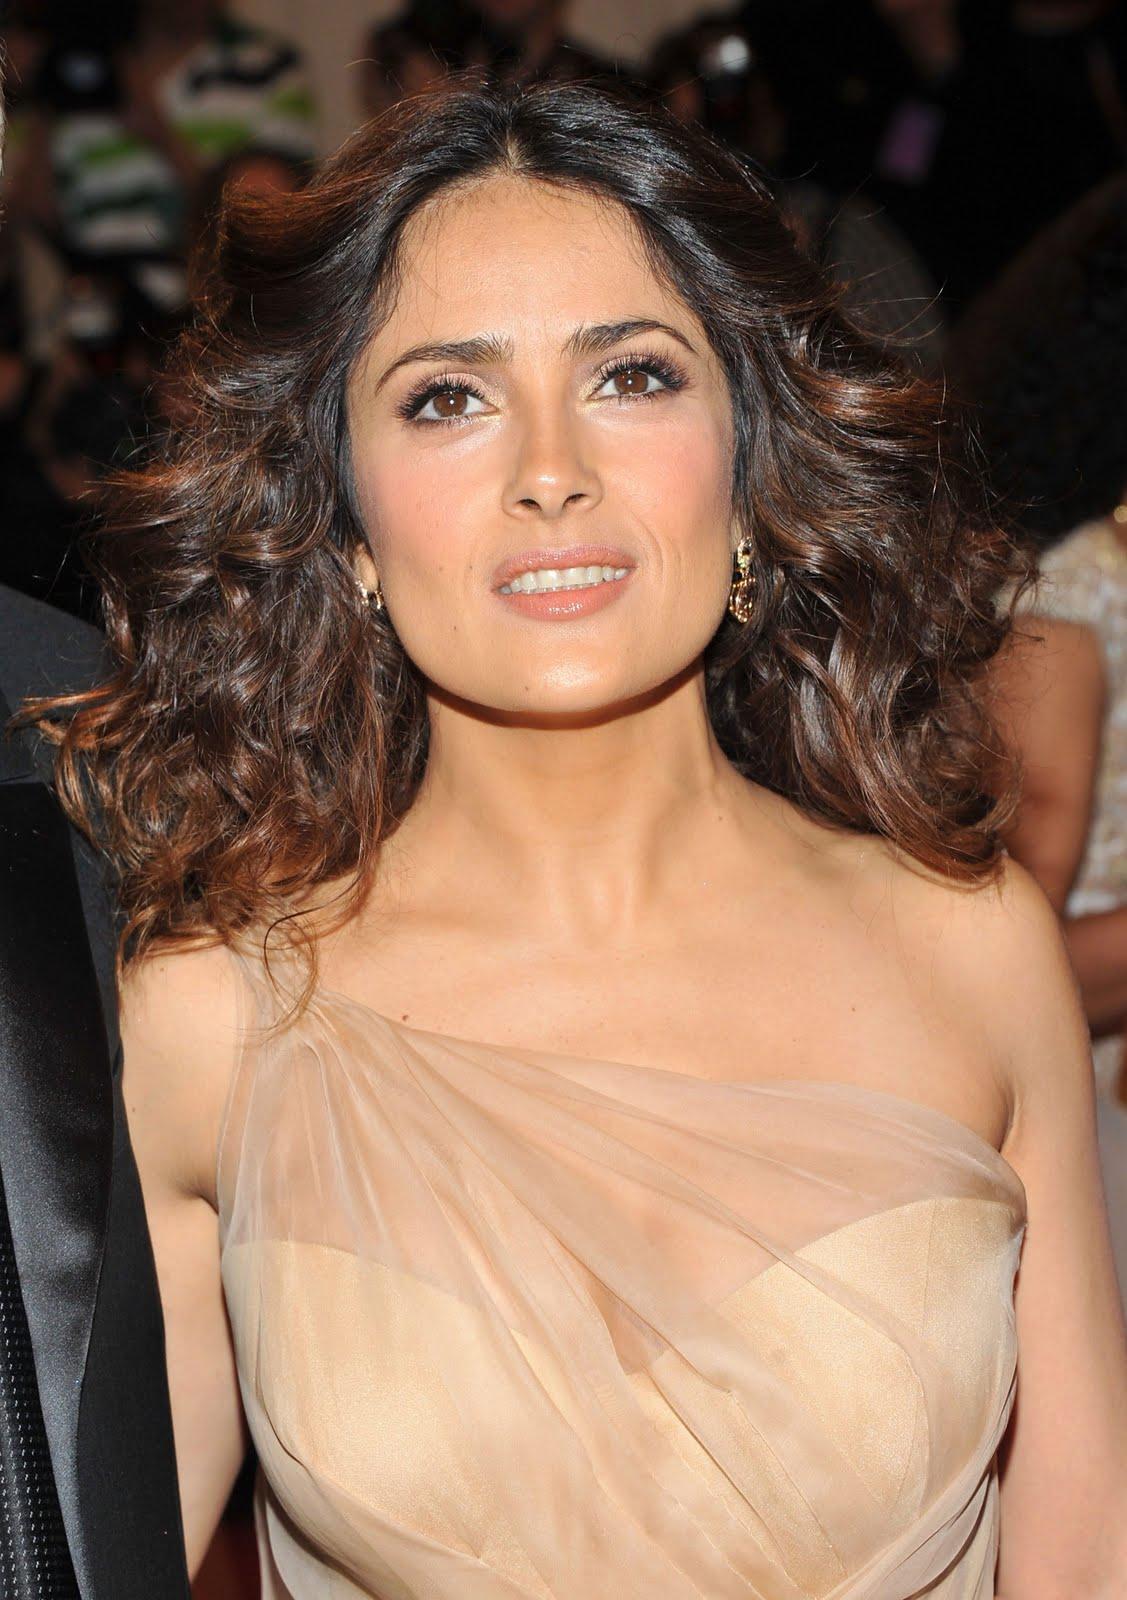 http://1.bp.blogspot.com/-tTHVDroEgtA/Tl9gh_AOR9I/AAAAAAAAAa0/a_mL2N8CywU/s1600/Salma-Hayek-pics-images-photos-pictures-videos-Actress-movies+%25285%2529.jpg